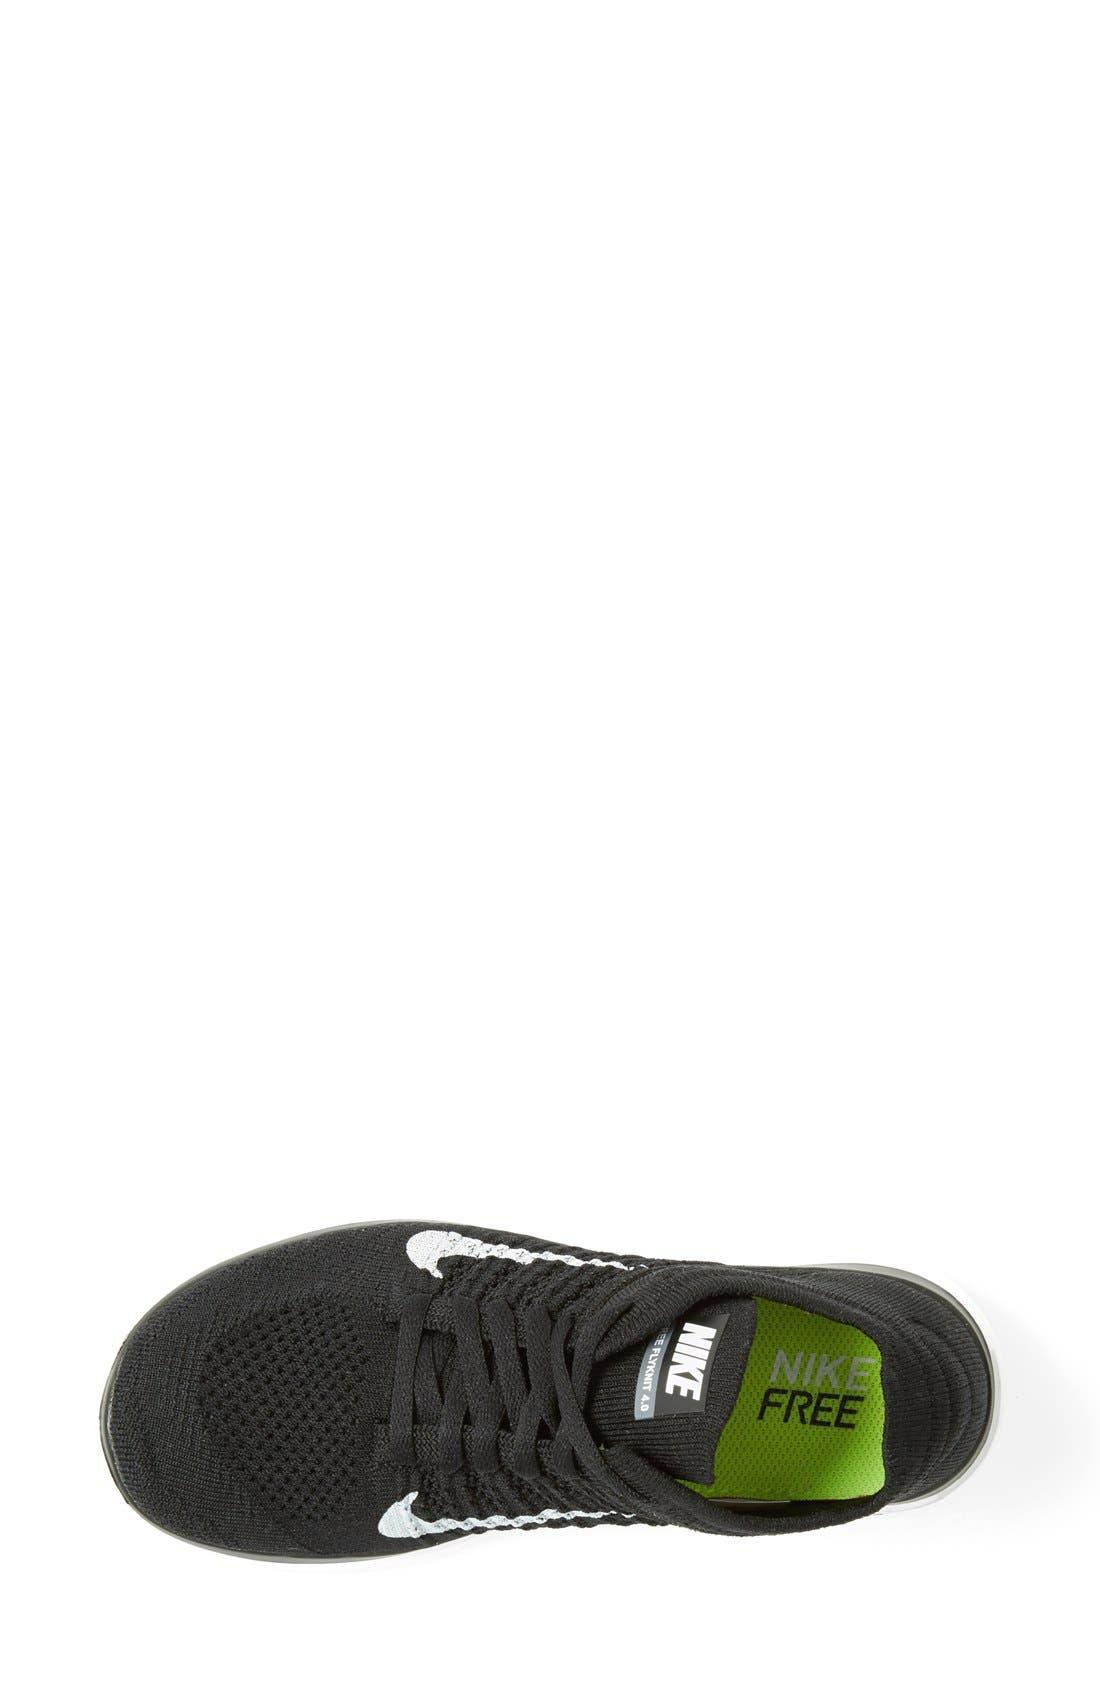 NIKE, 'Free 4.0 Flyknit' Running Shoe, Alternate thumbnail 4, color, 001